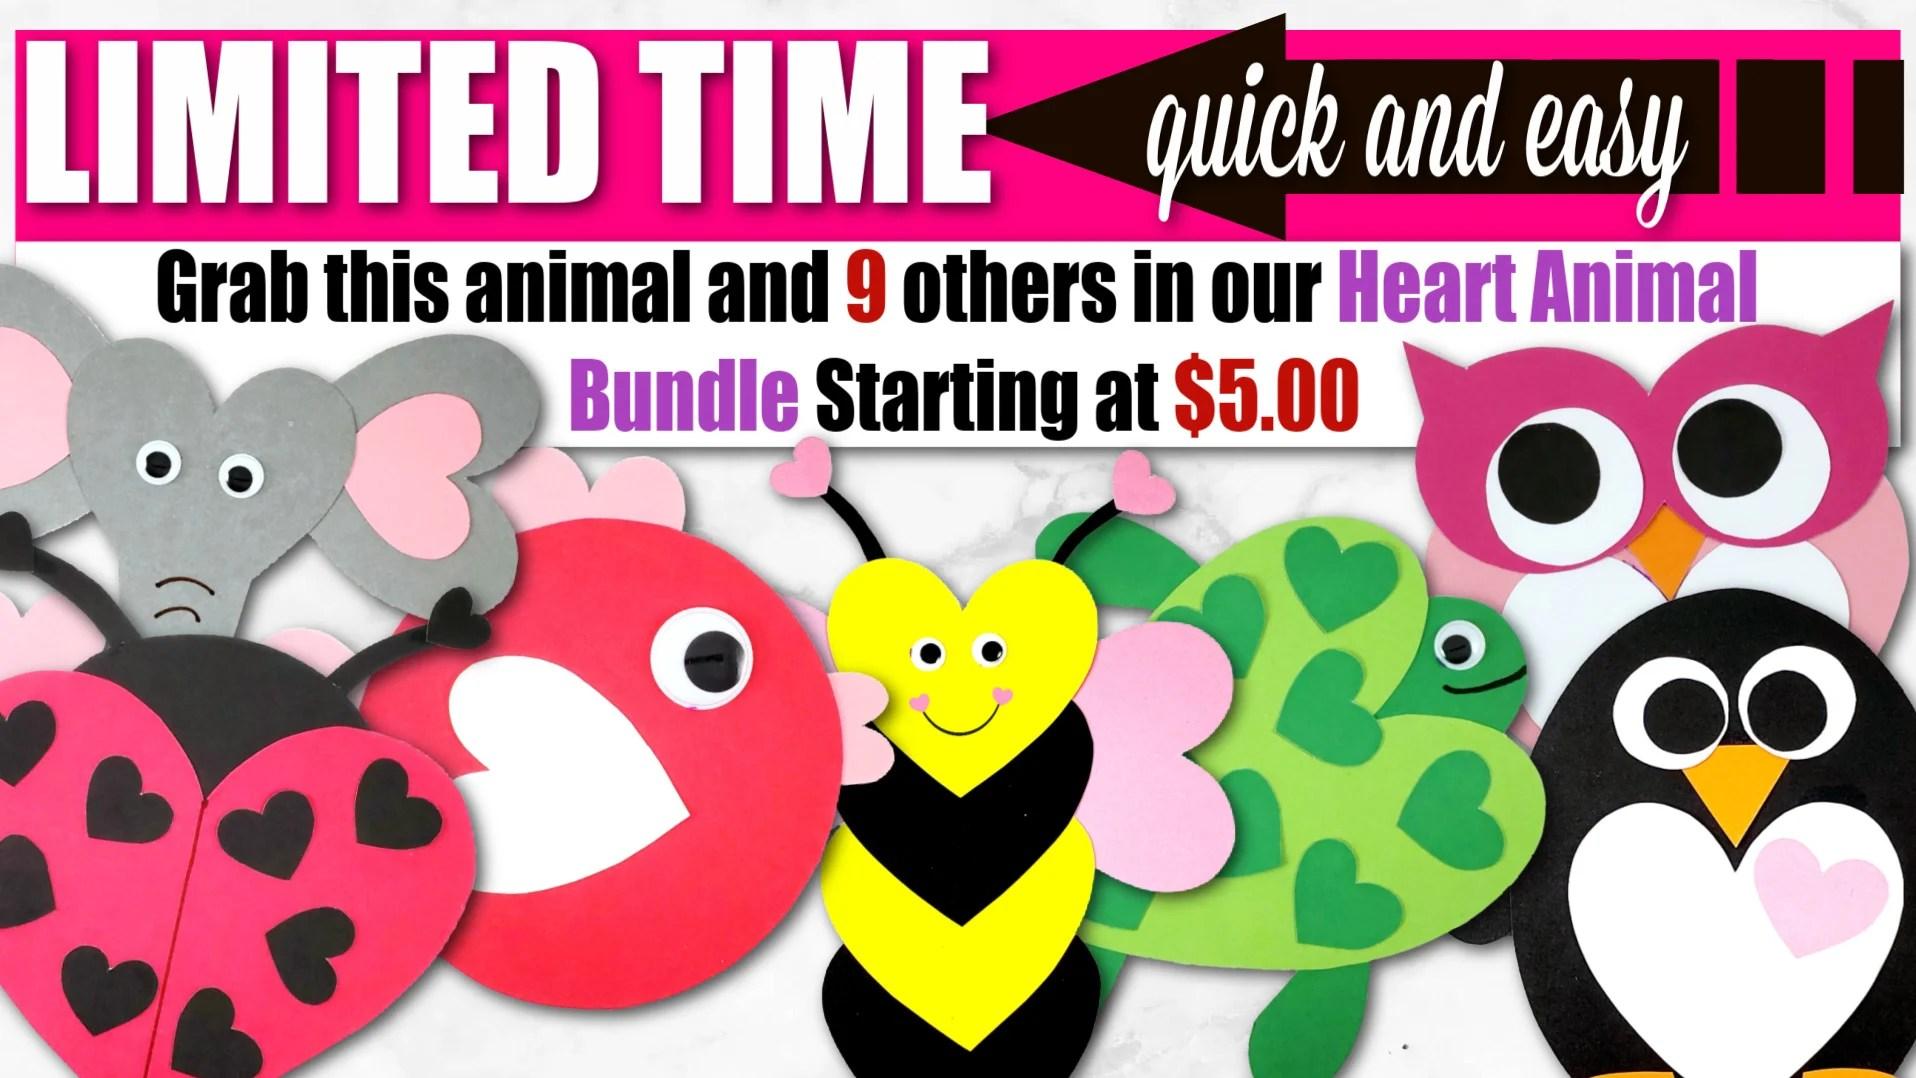 Paint a rock to look like a ladybug: Free Printable Heart Shaped Ladybug Craft Simple Mom Project